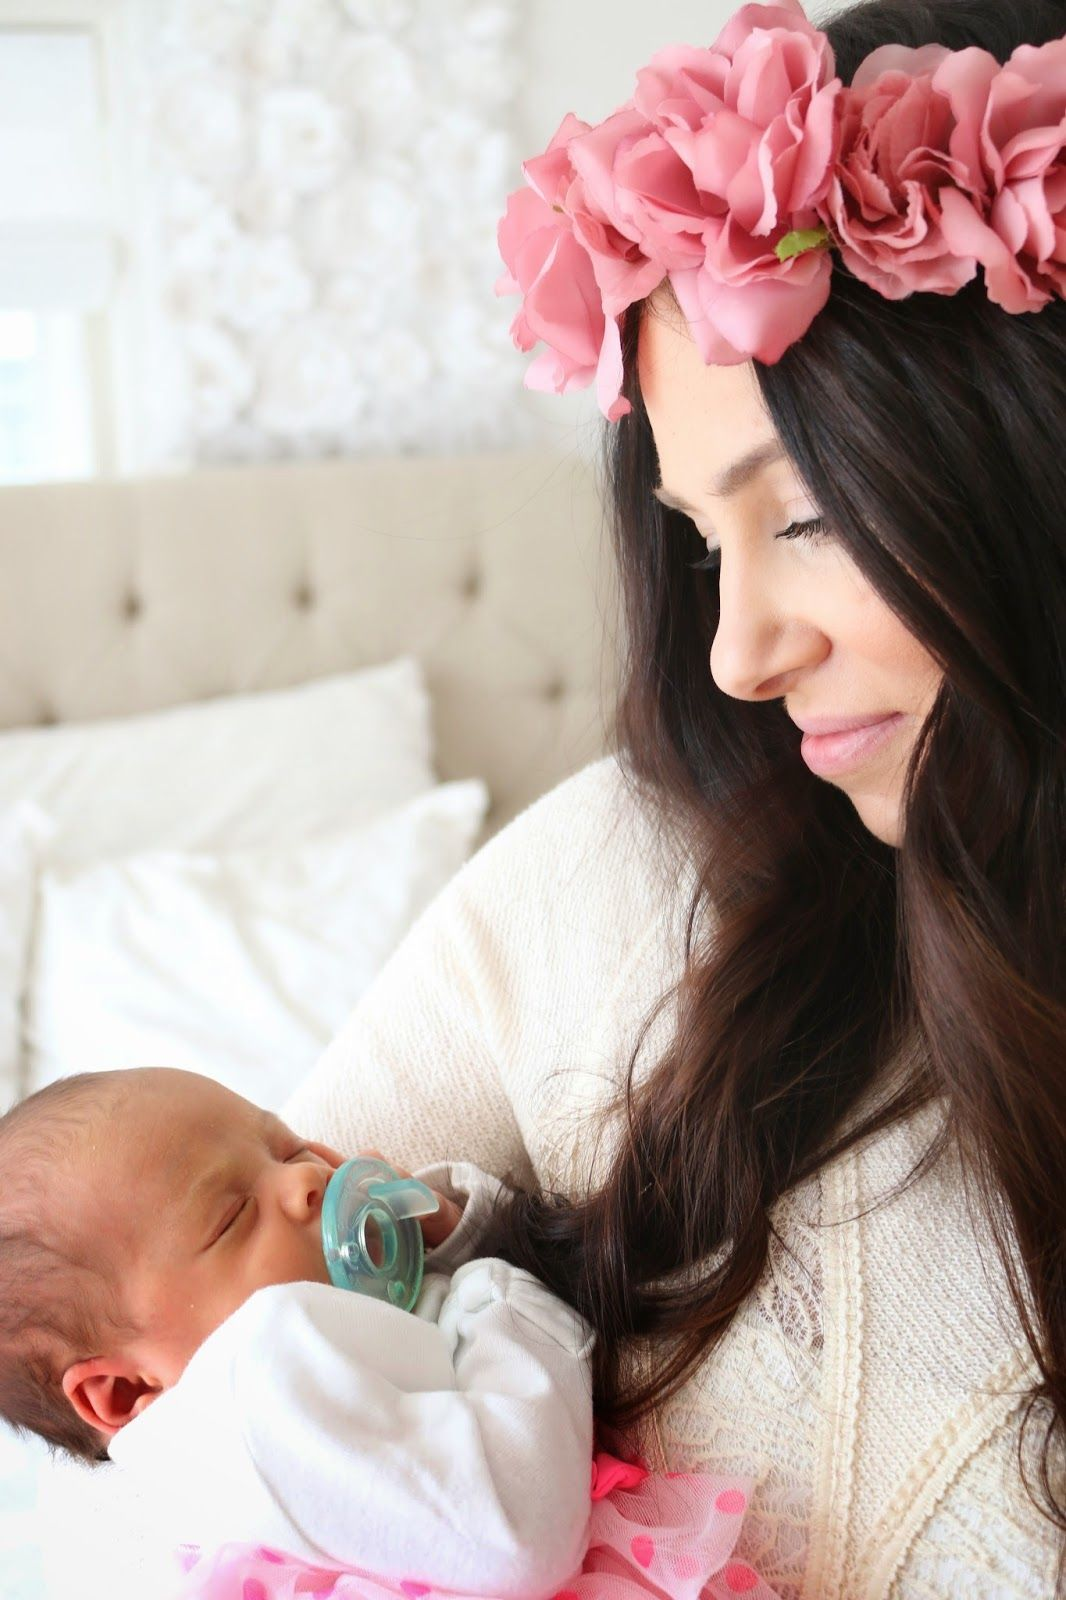 Newborn, In-Home Photo Session, dv3 photography, dv3photo